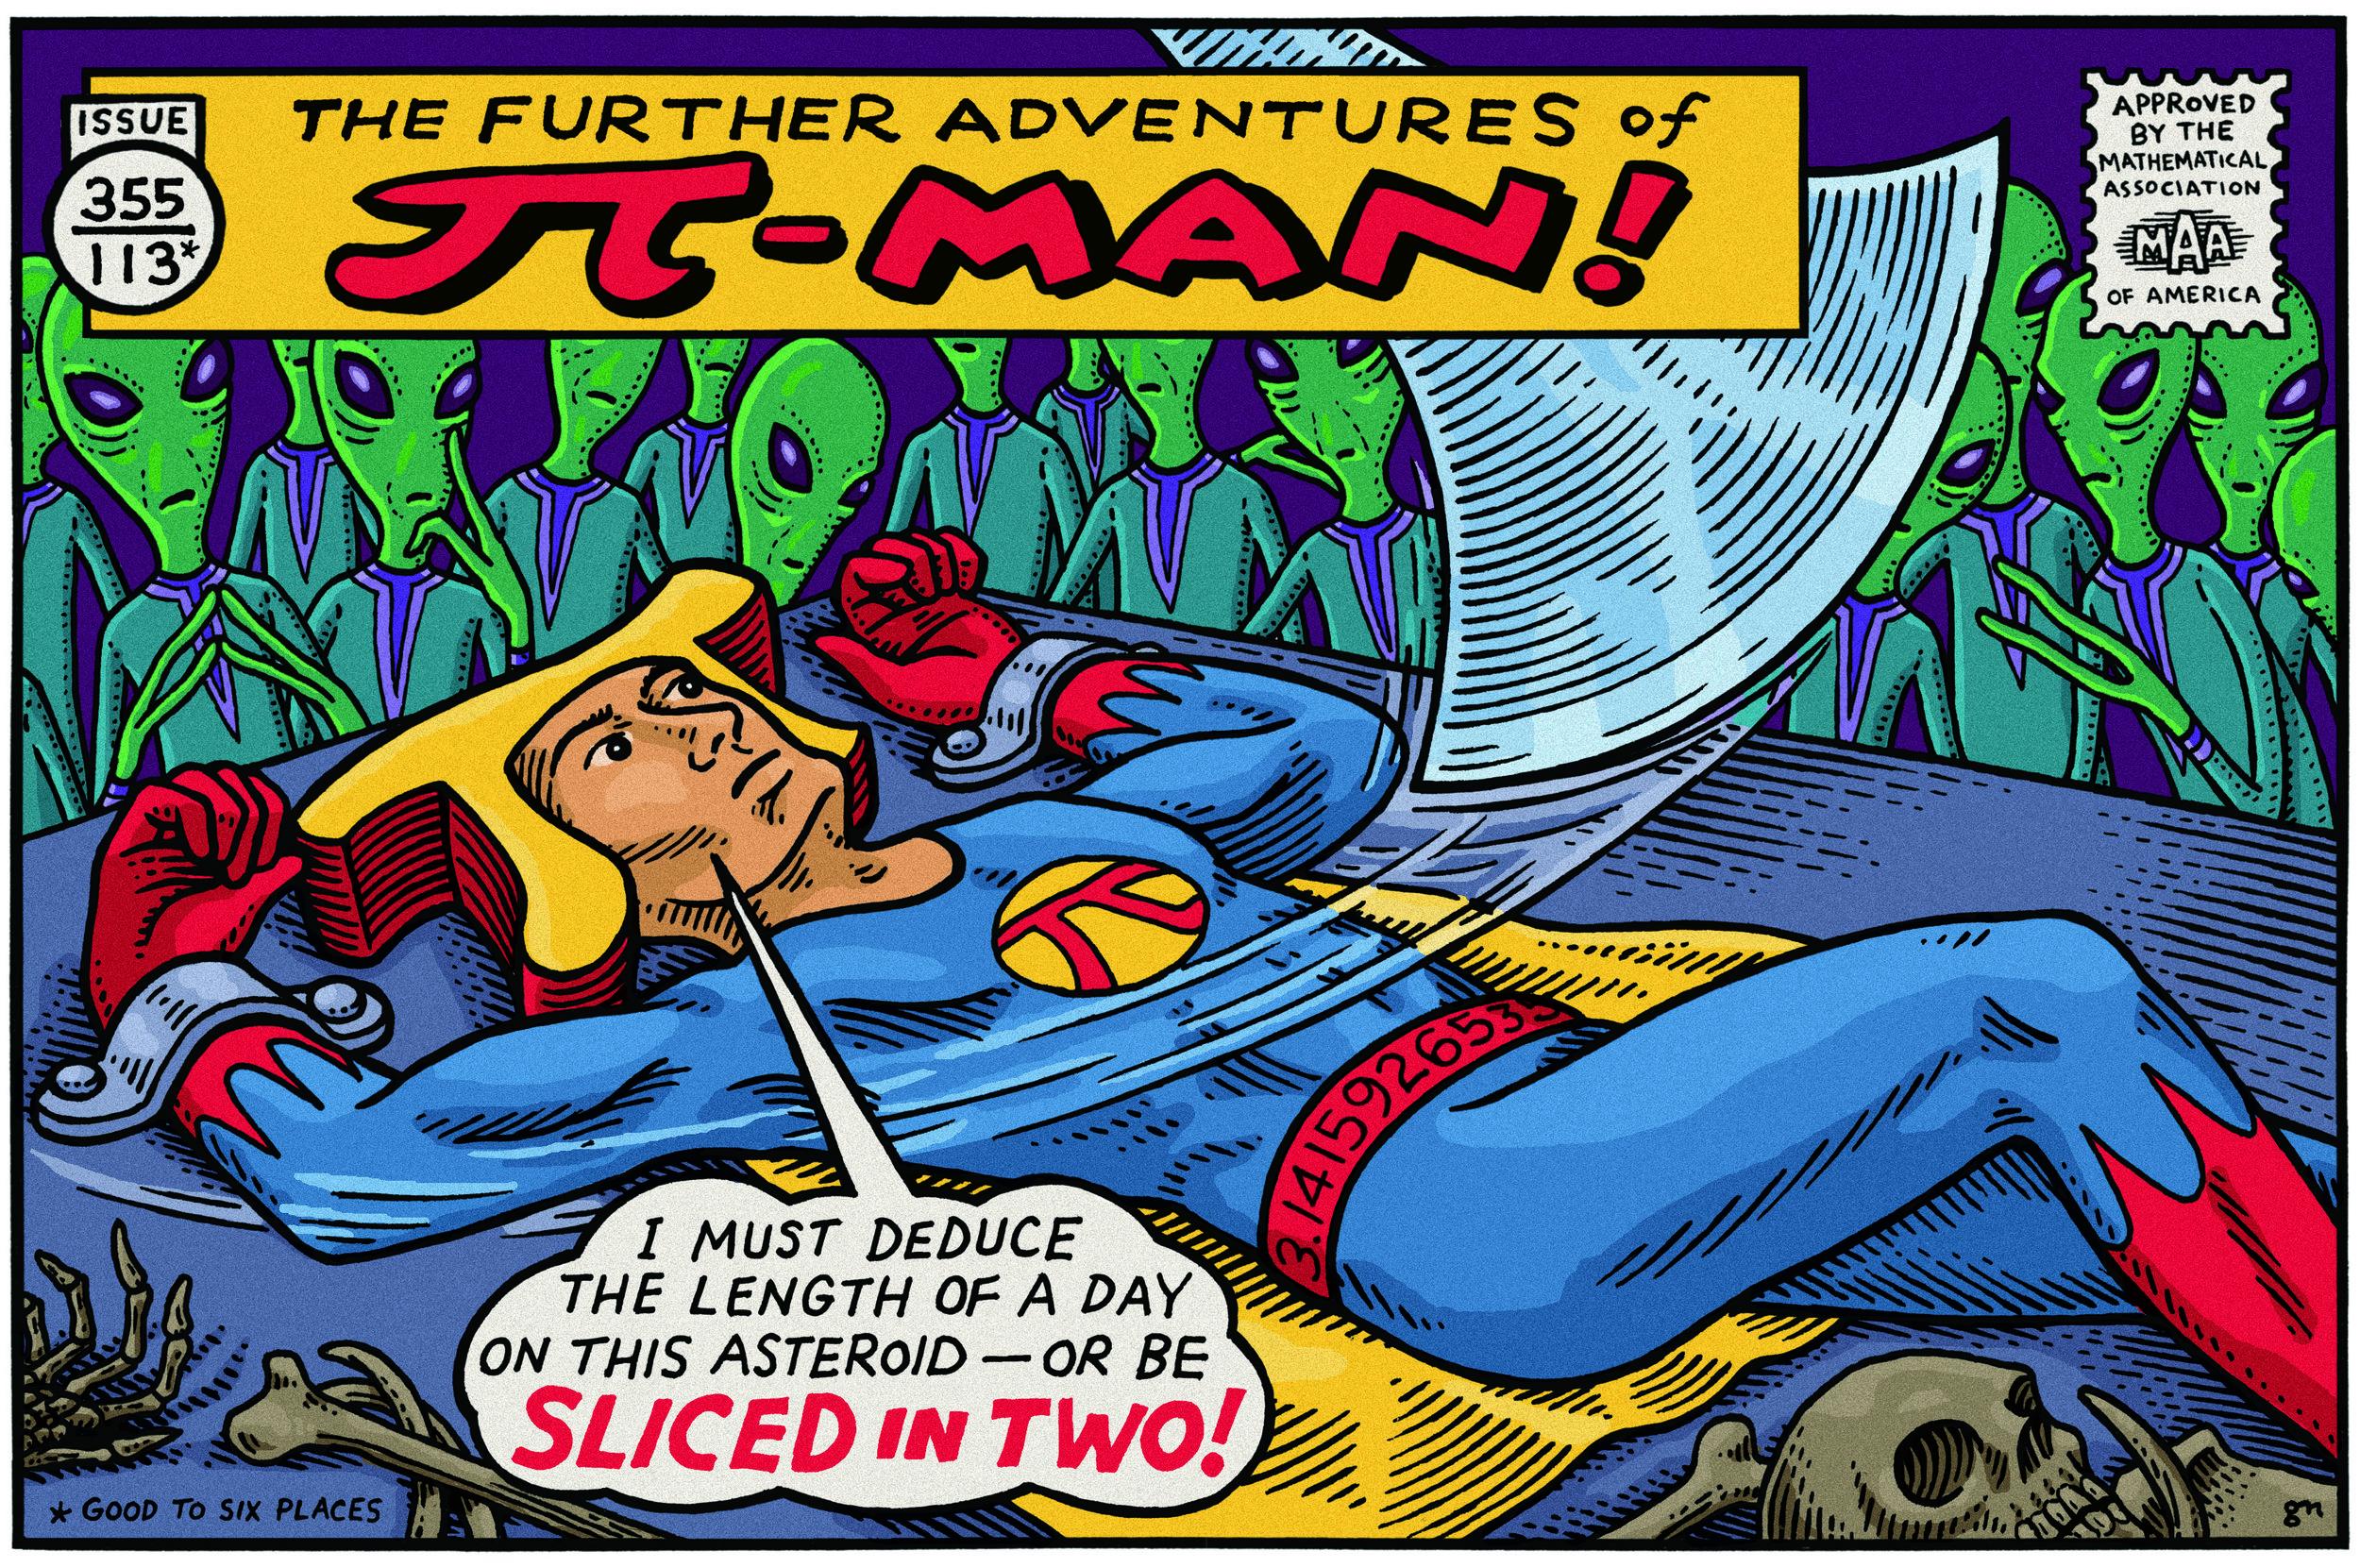 pi man returns in color.jpg